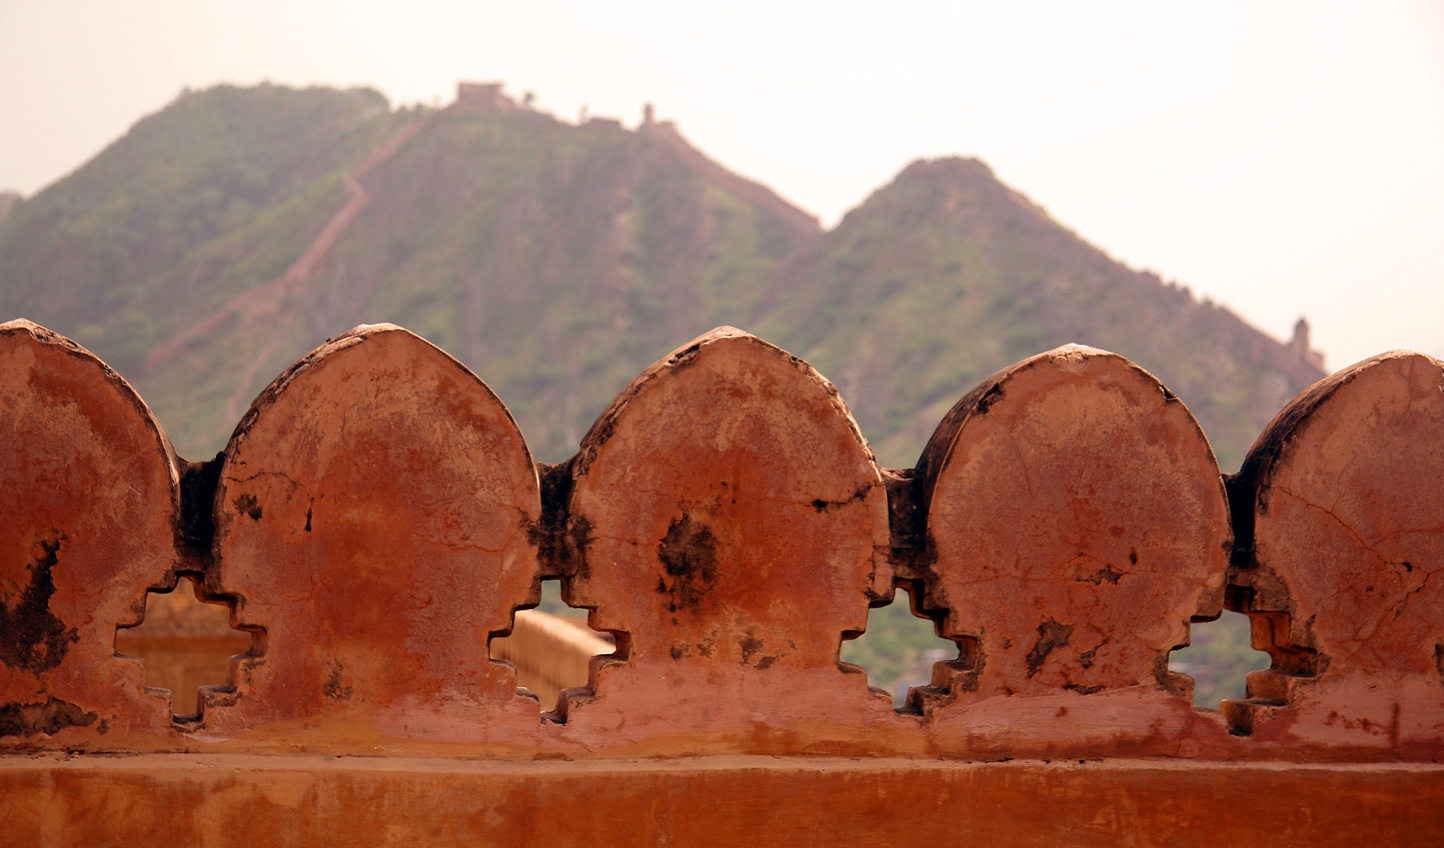 Walk along the ramparts overlooking the city below